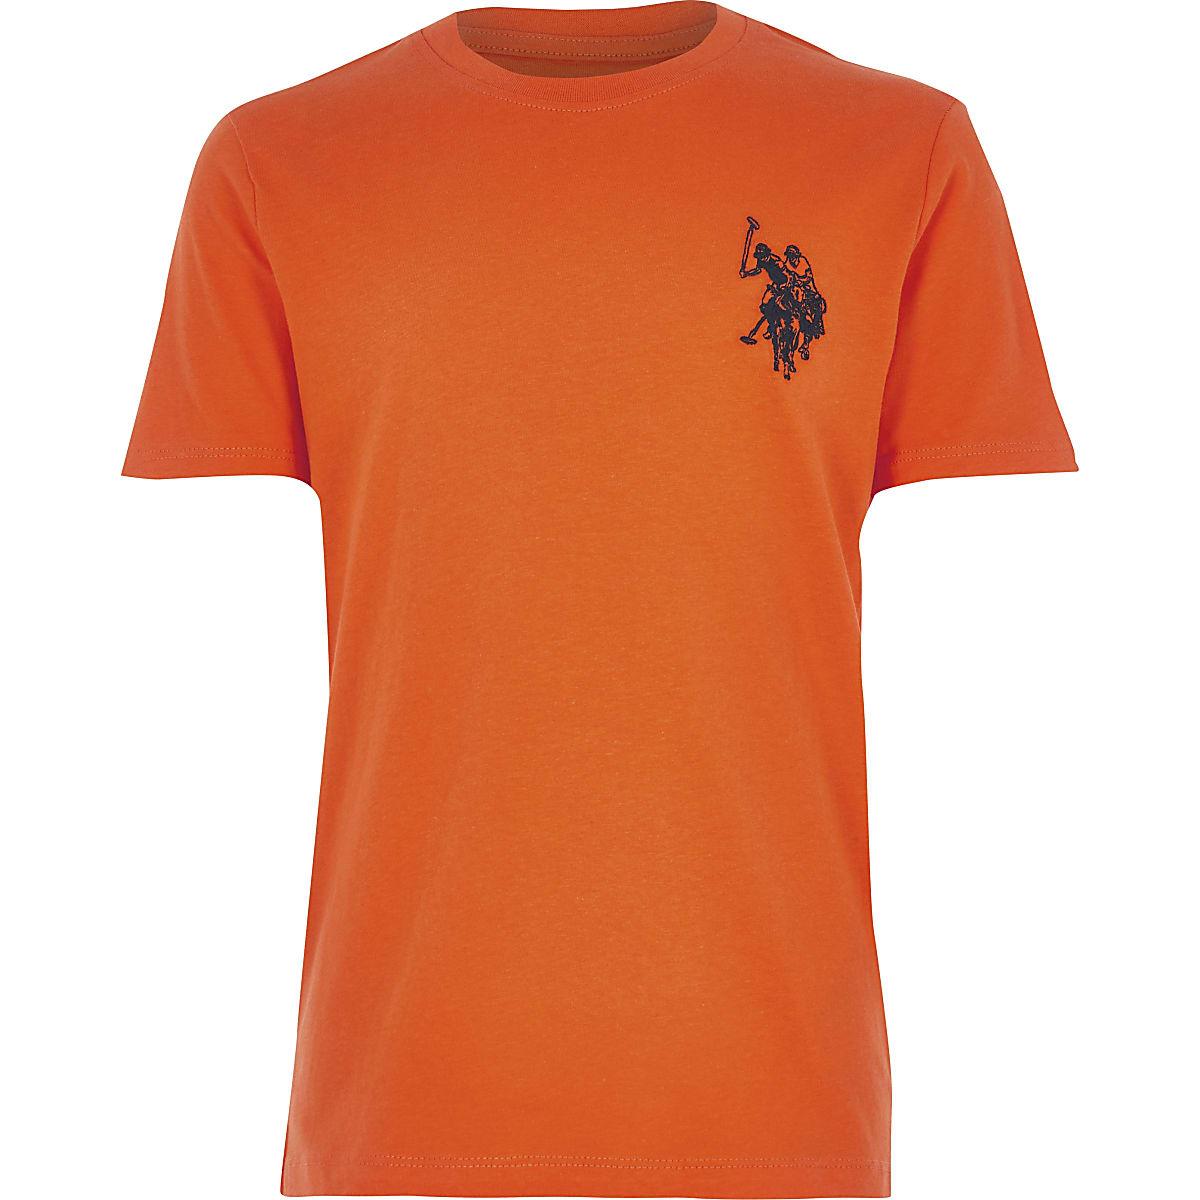 Boys orange U.S. Polo Assn.T-shirt